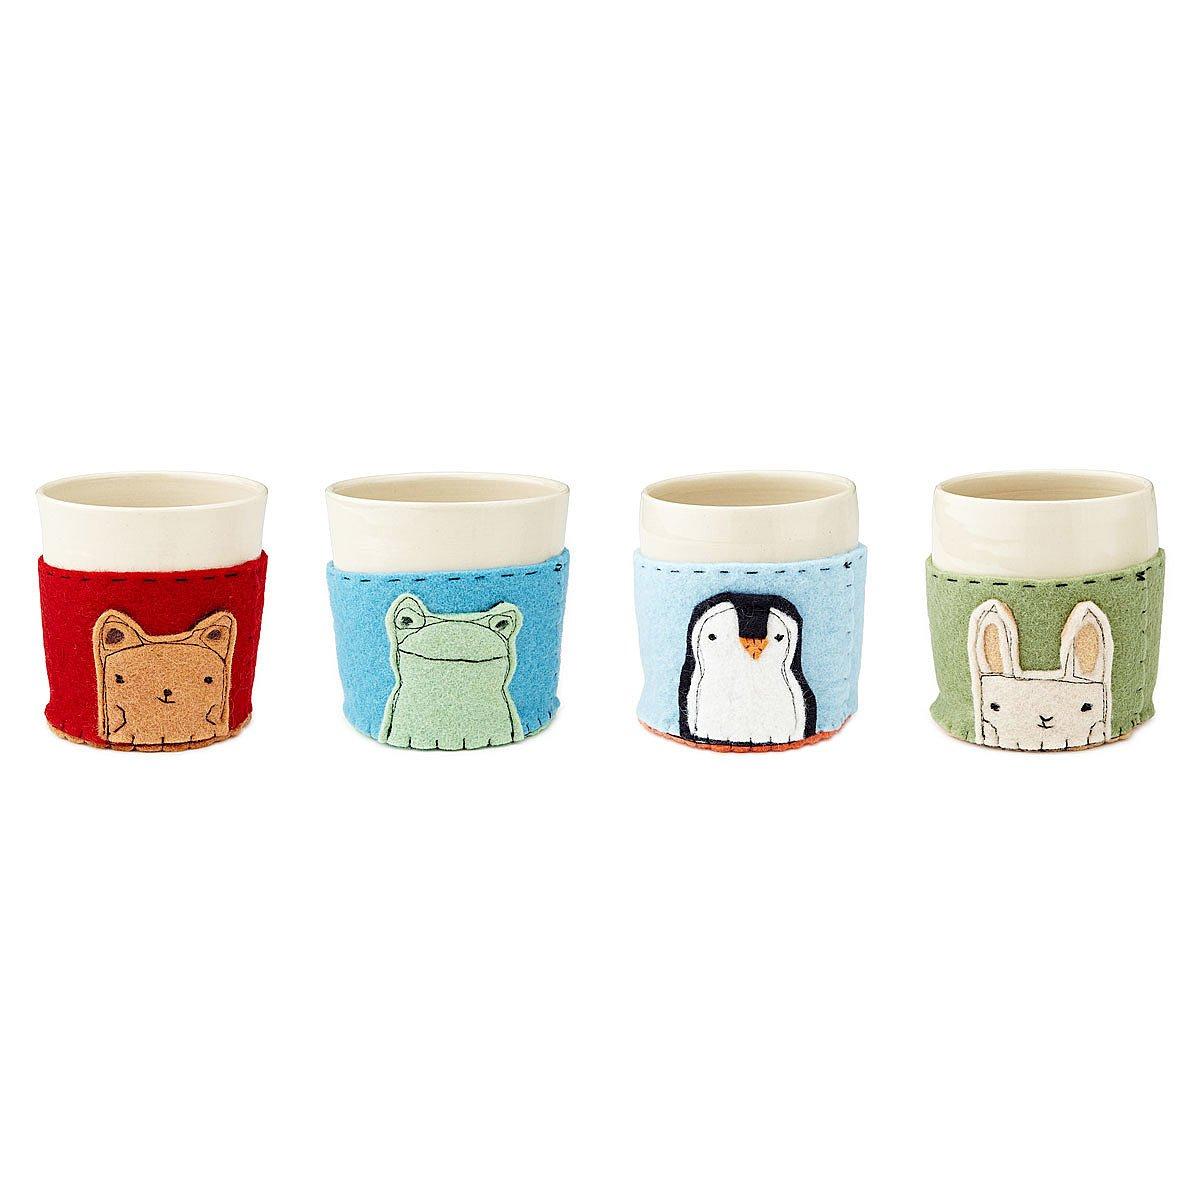 Ceramic Cups With Felt Applique Cozies Handmade Sleeve